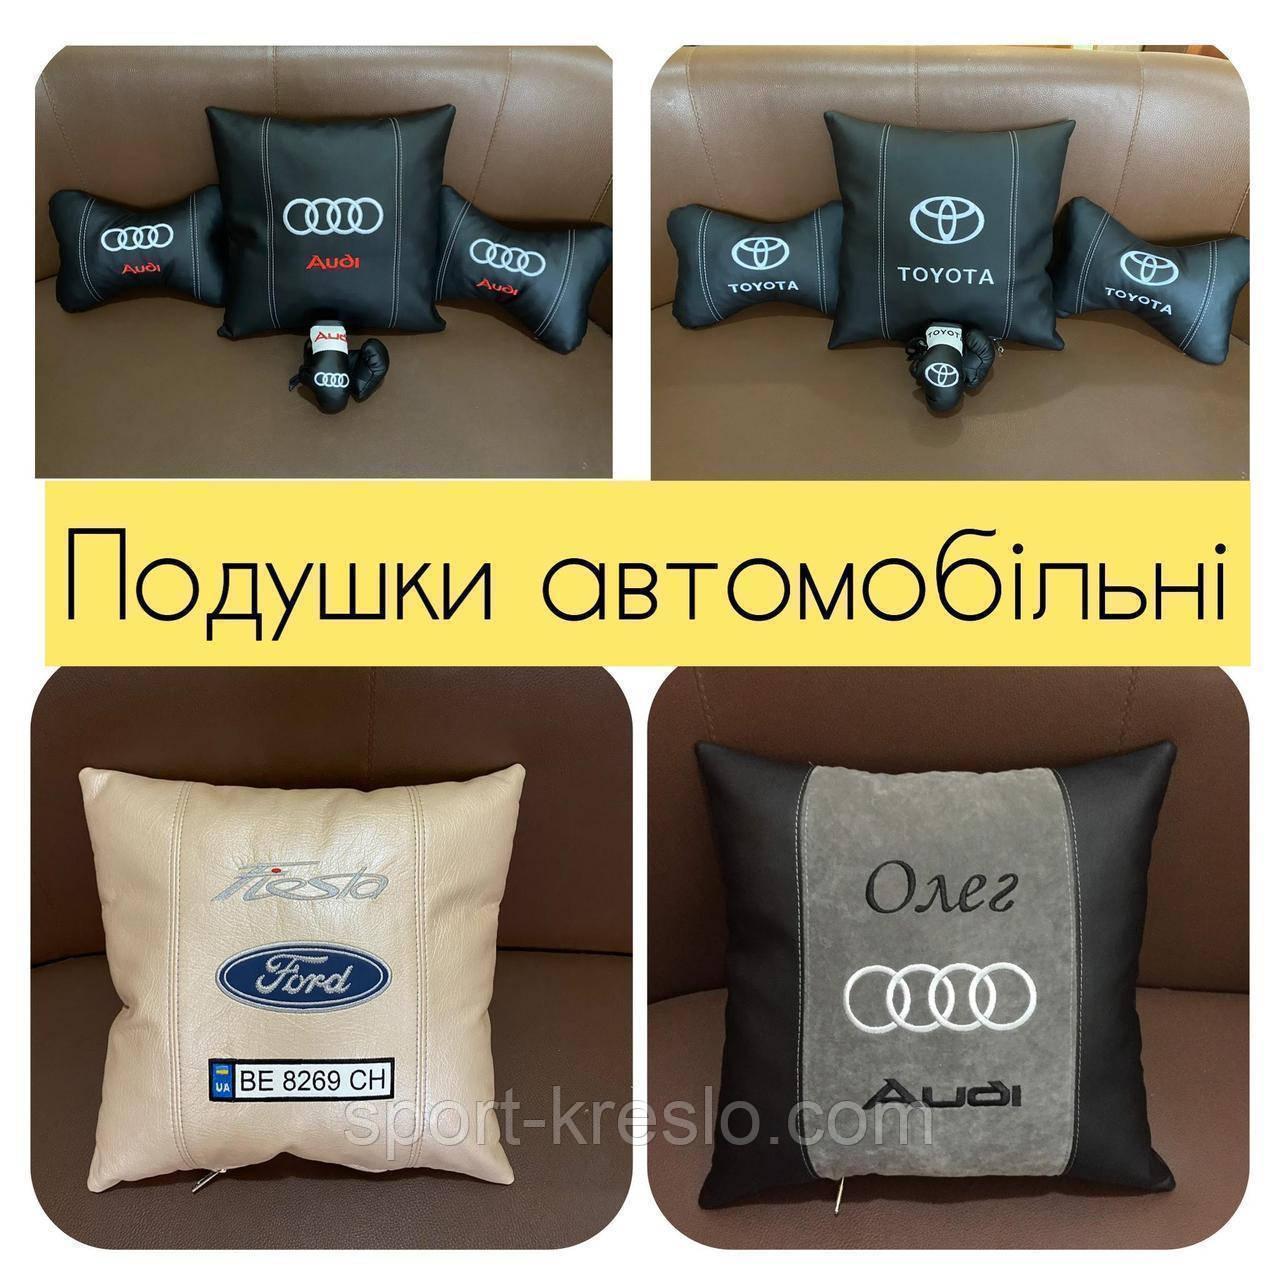 Подушки с логотипом, подушки бабочка на подголовник в салон авто, автоаксессуары